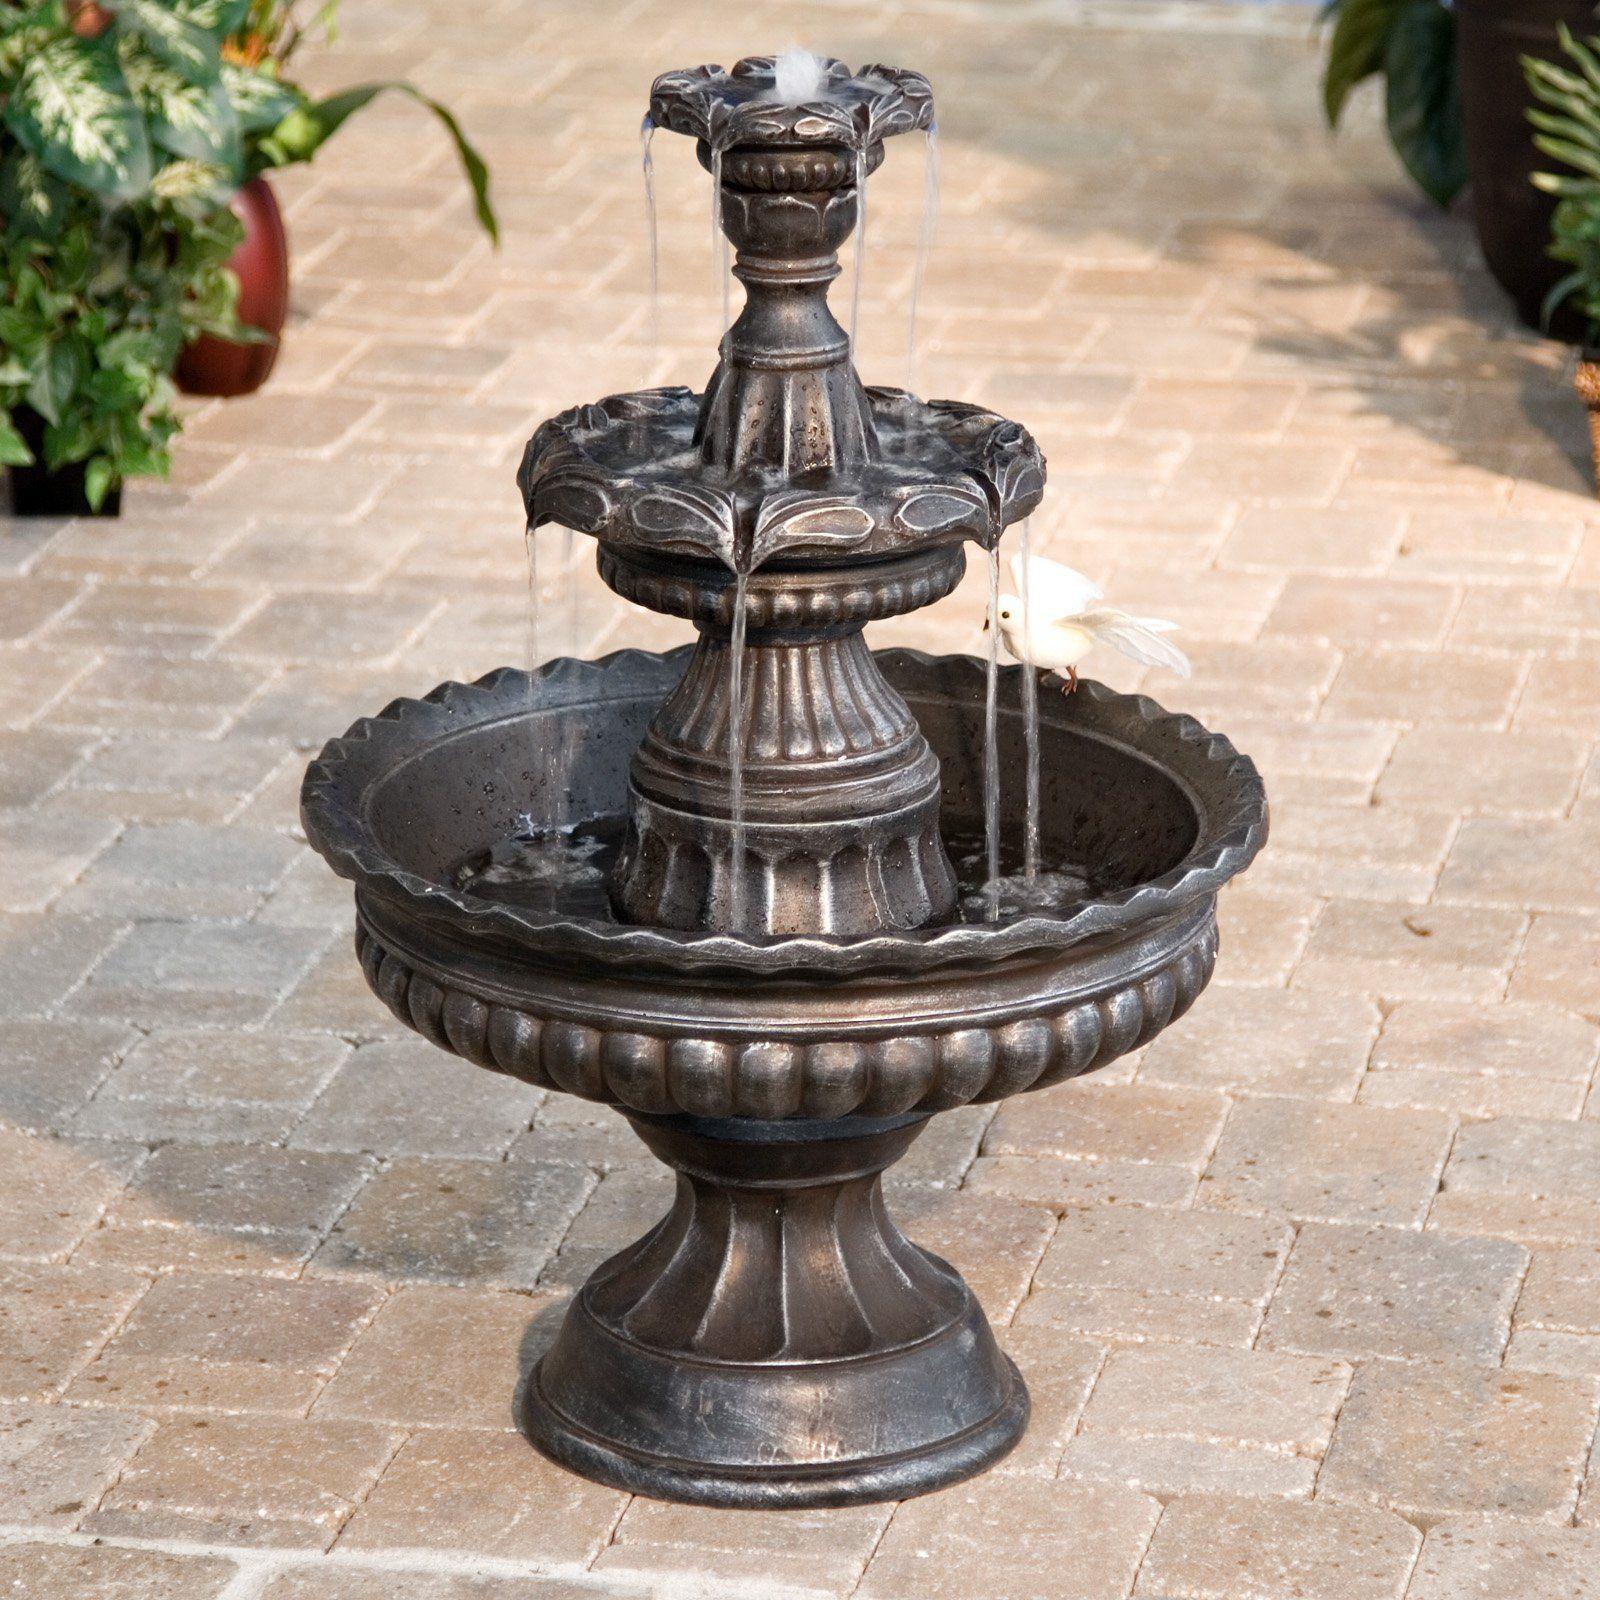 Tiered Garden Fountain 3 Tier Water Outdoor Decor Patio Pump Fountains Outdoor Fountains Backyard Outdoor Fountain